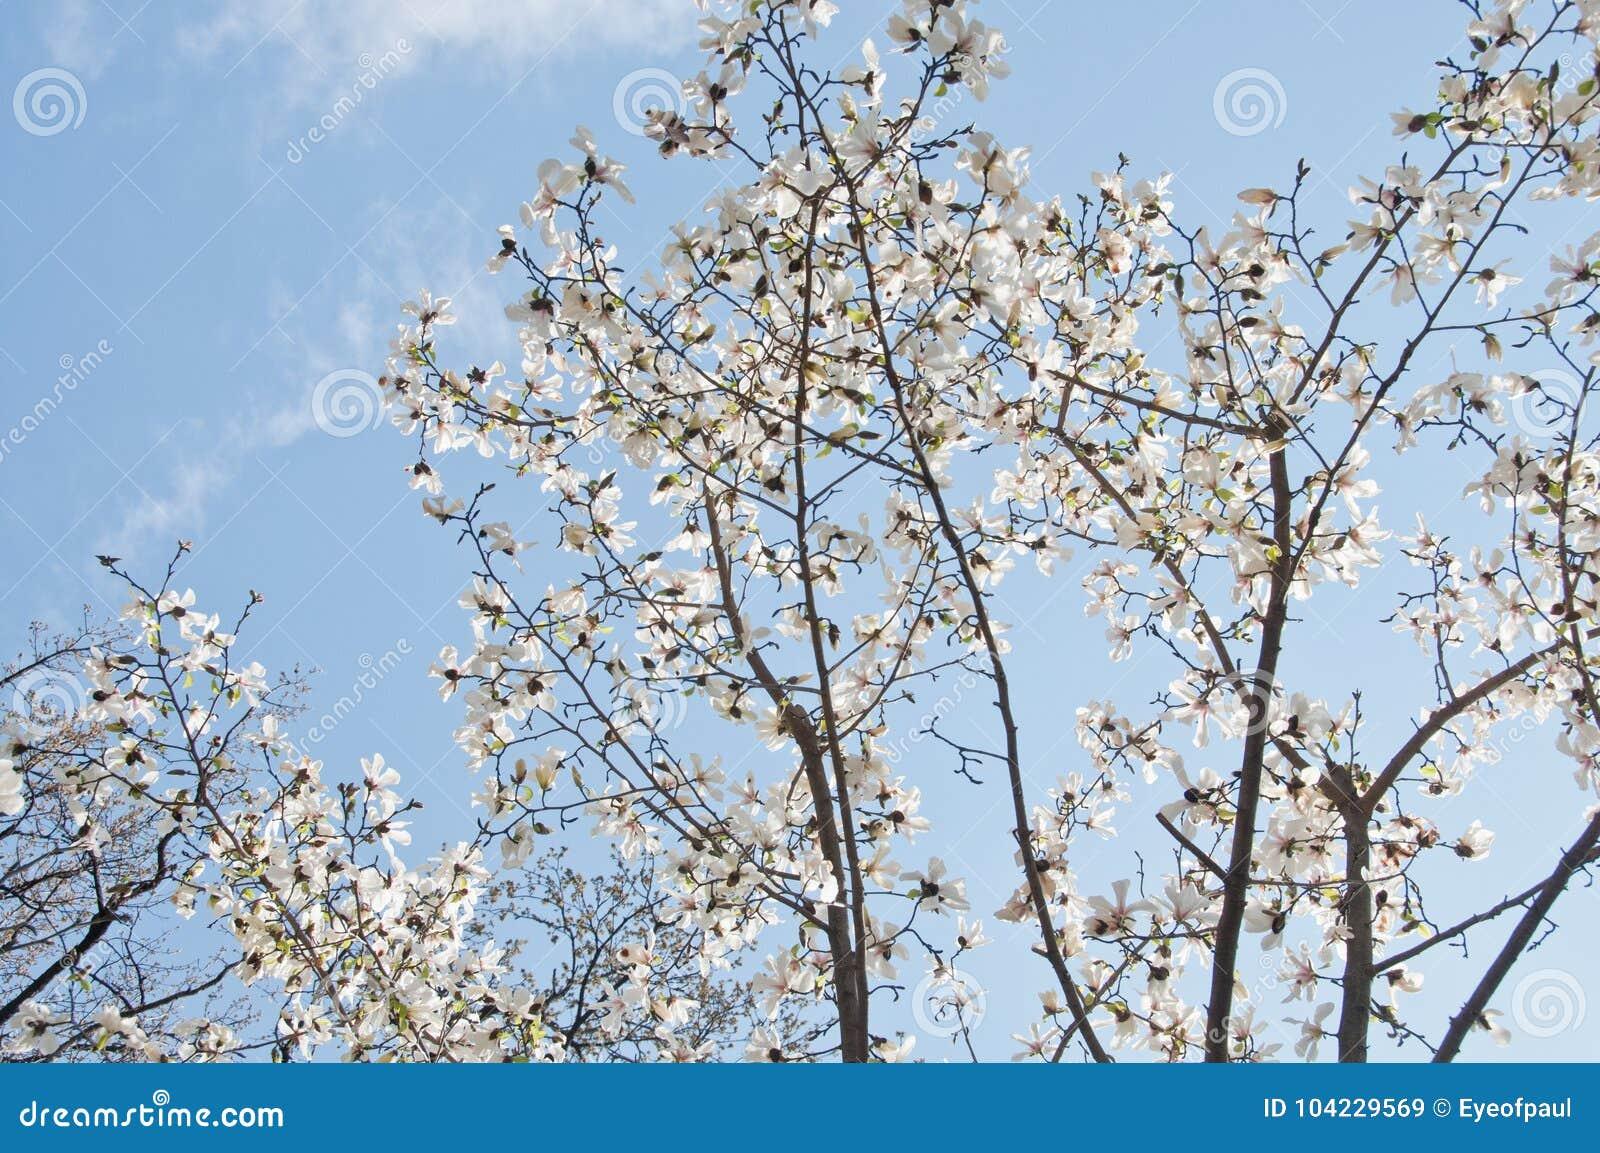 Beautiful full bloom cherry blossom sakura tree with blue bright download beautiful full bloom cherry blossom sakura tree with blue bright stock image image of izmirmasajfo